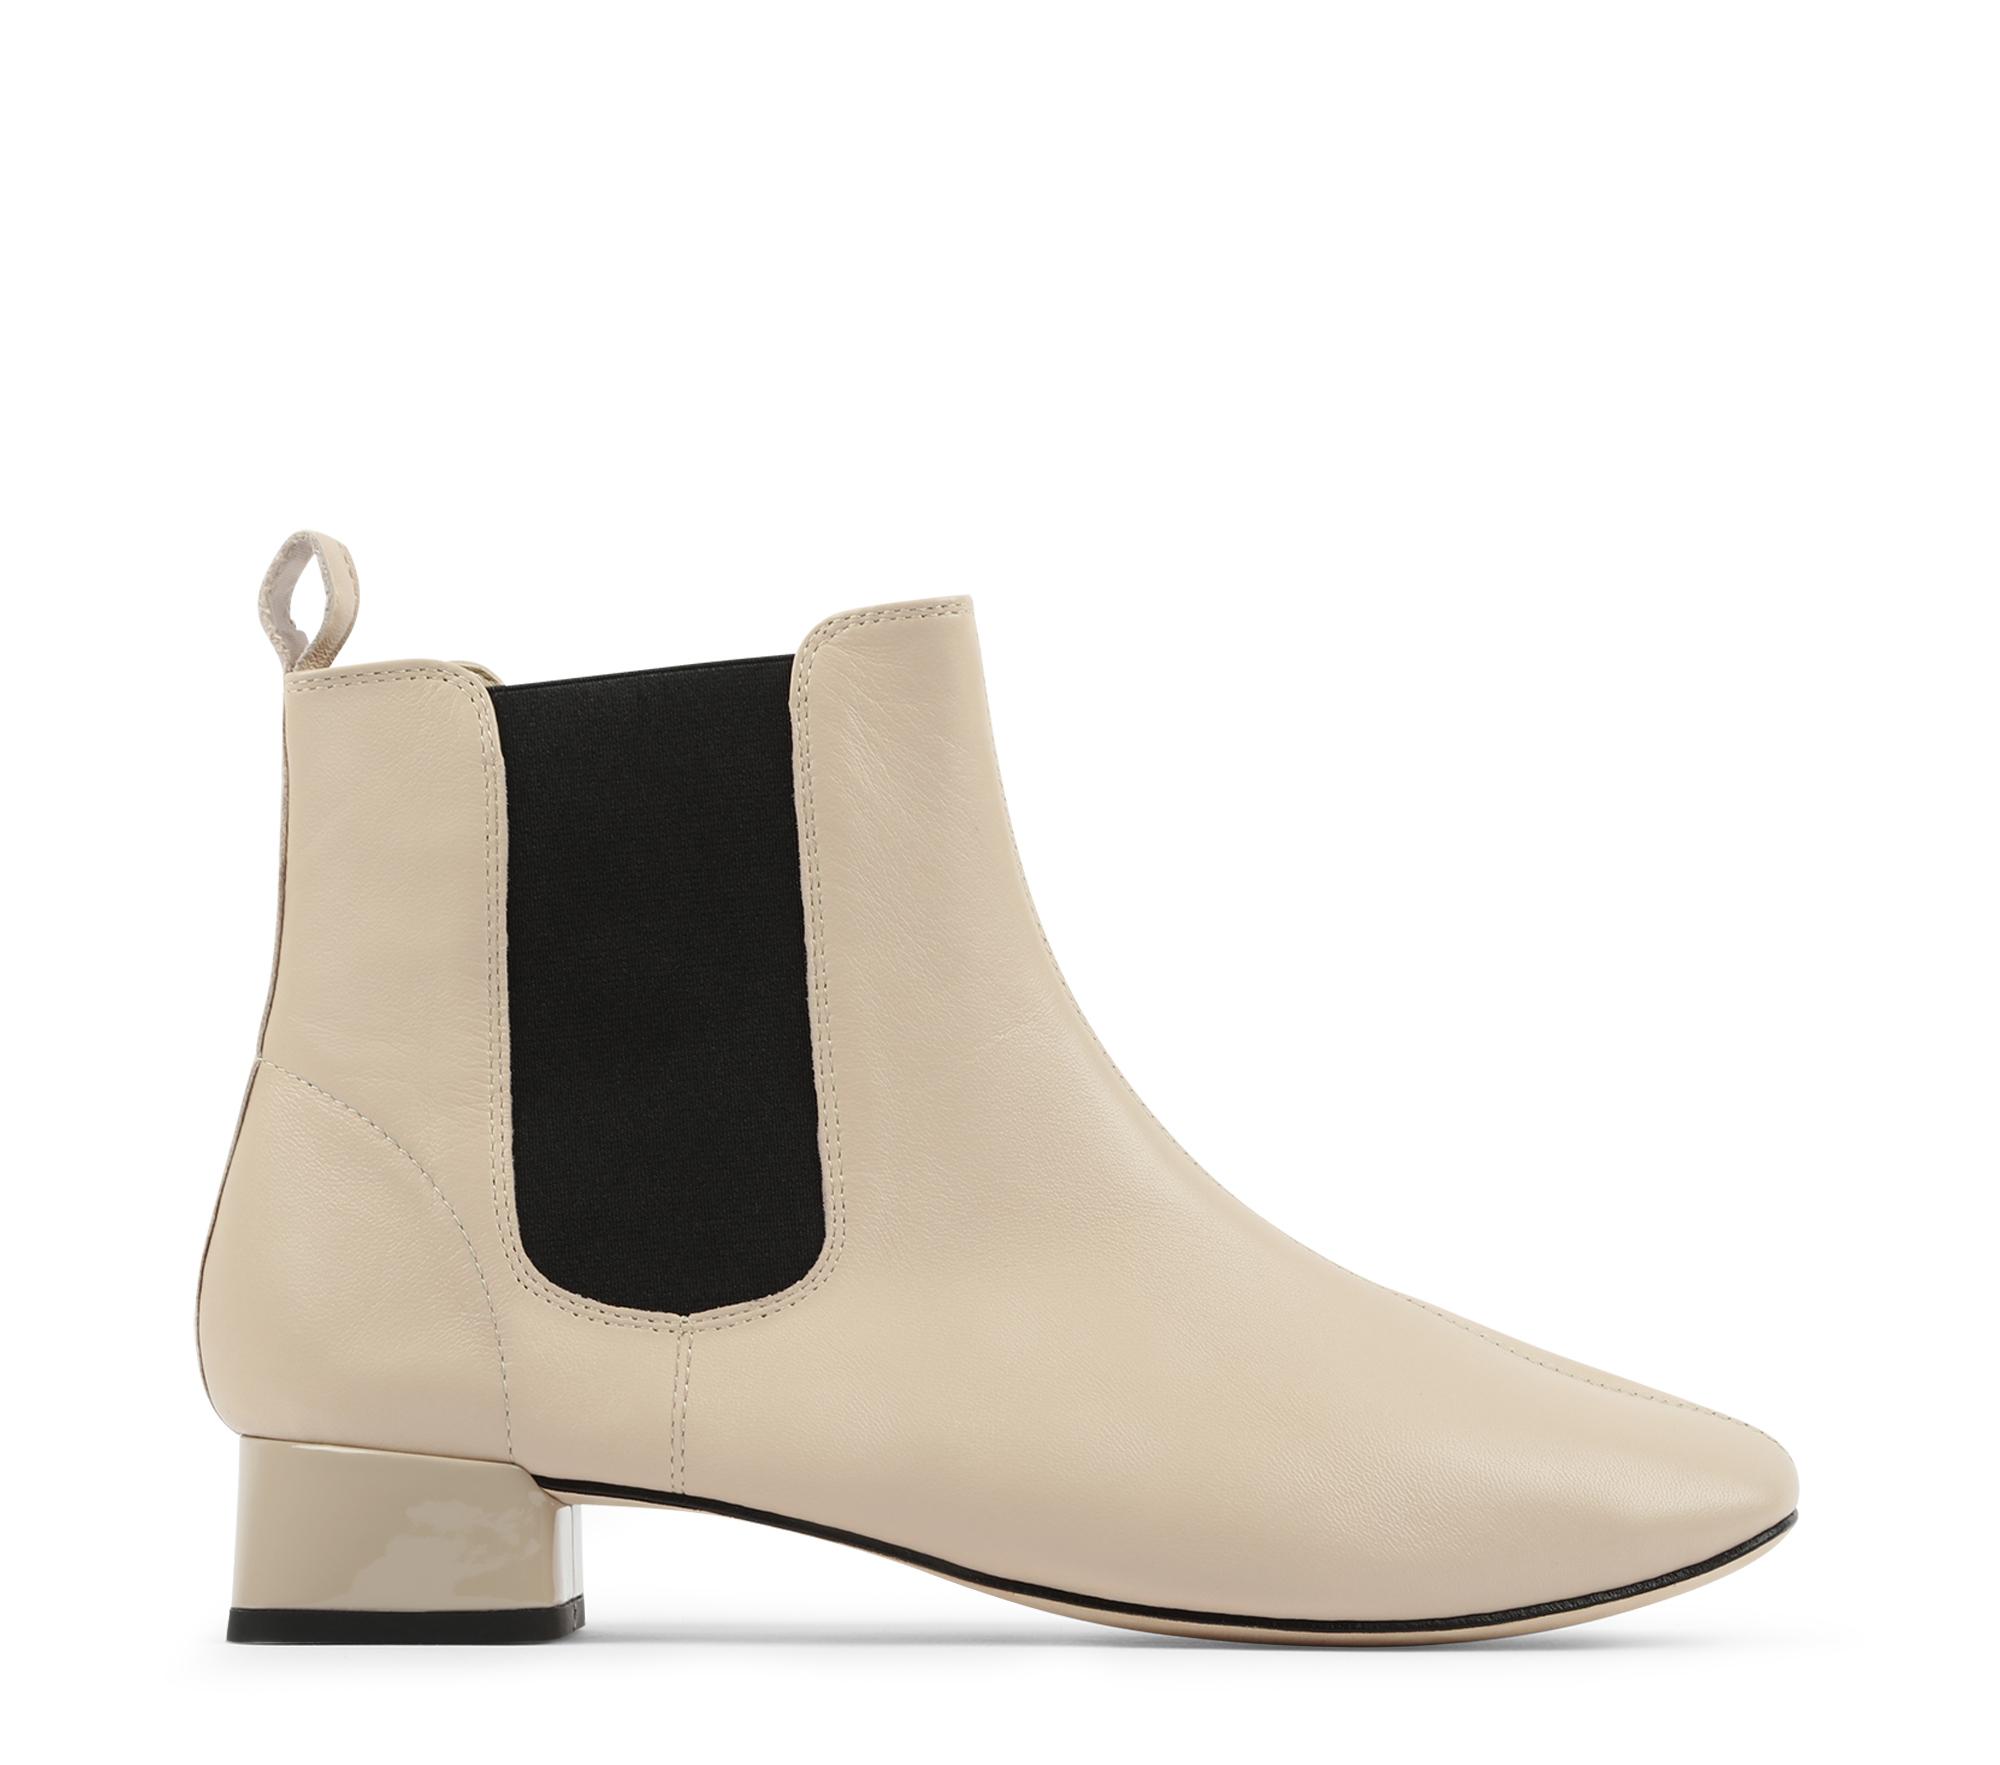 Milo boots